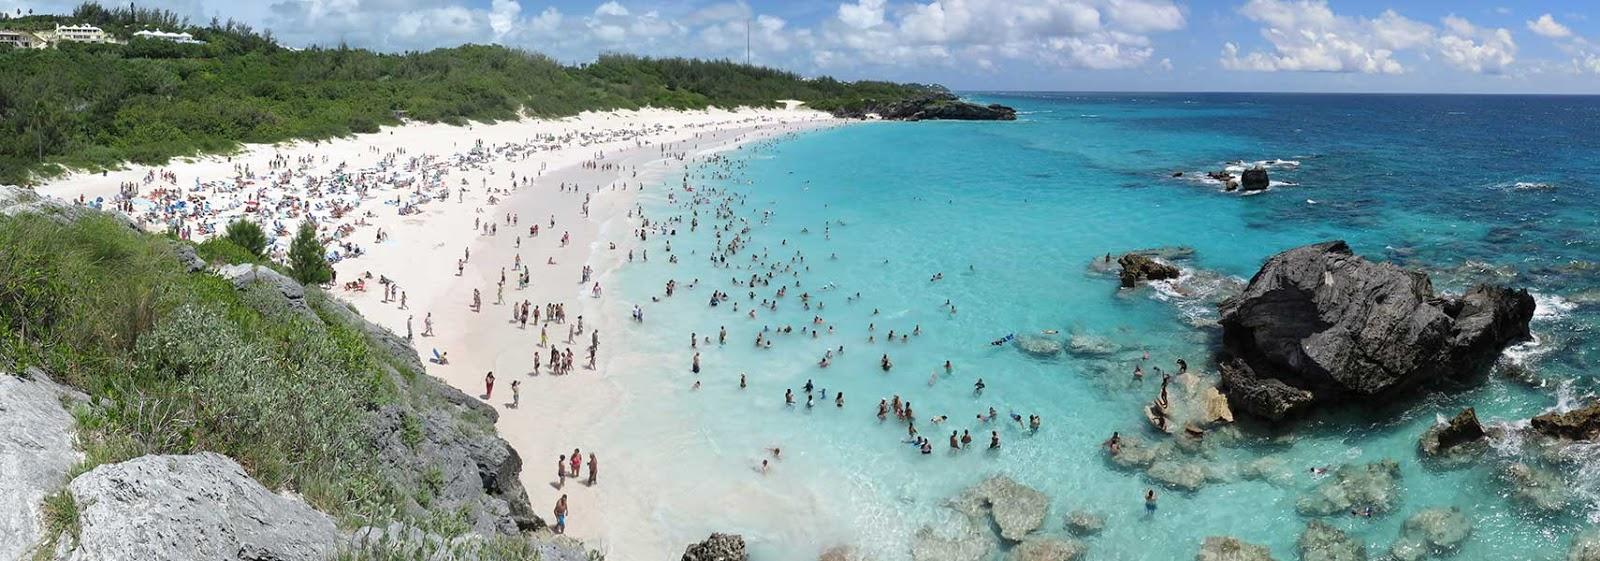 Bermuda Vacation Packages